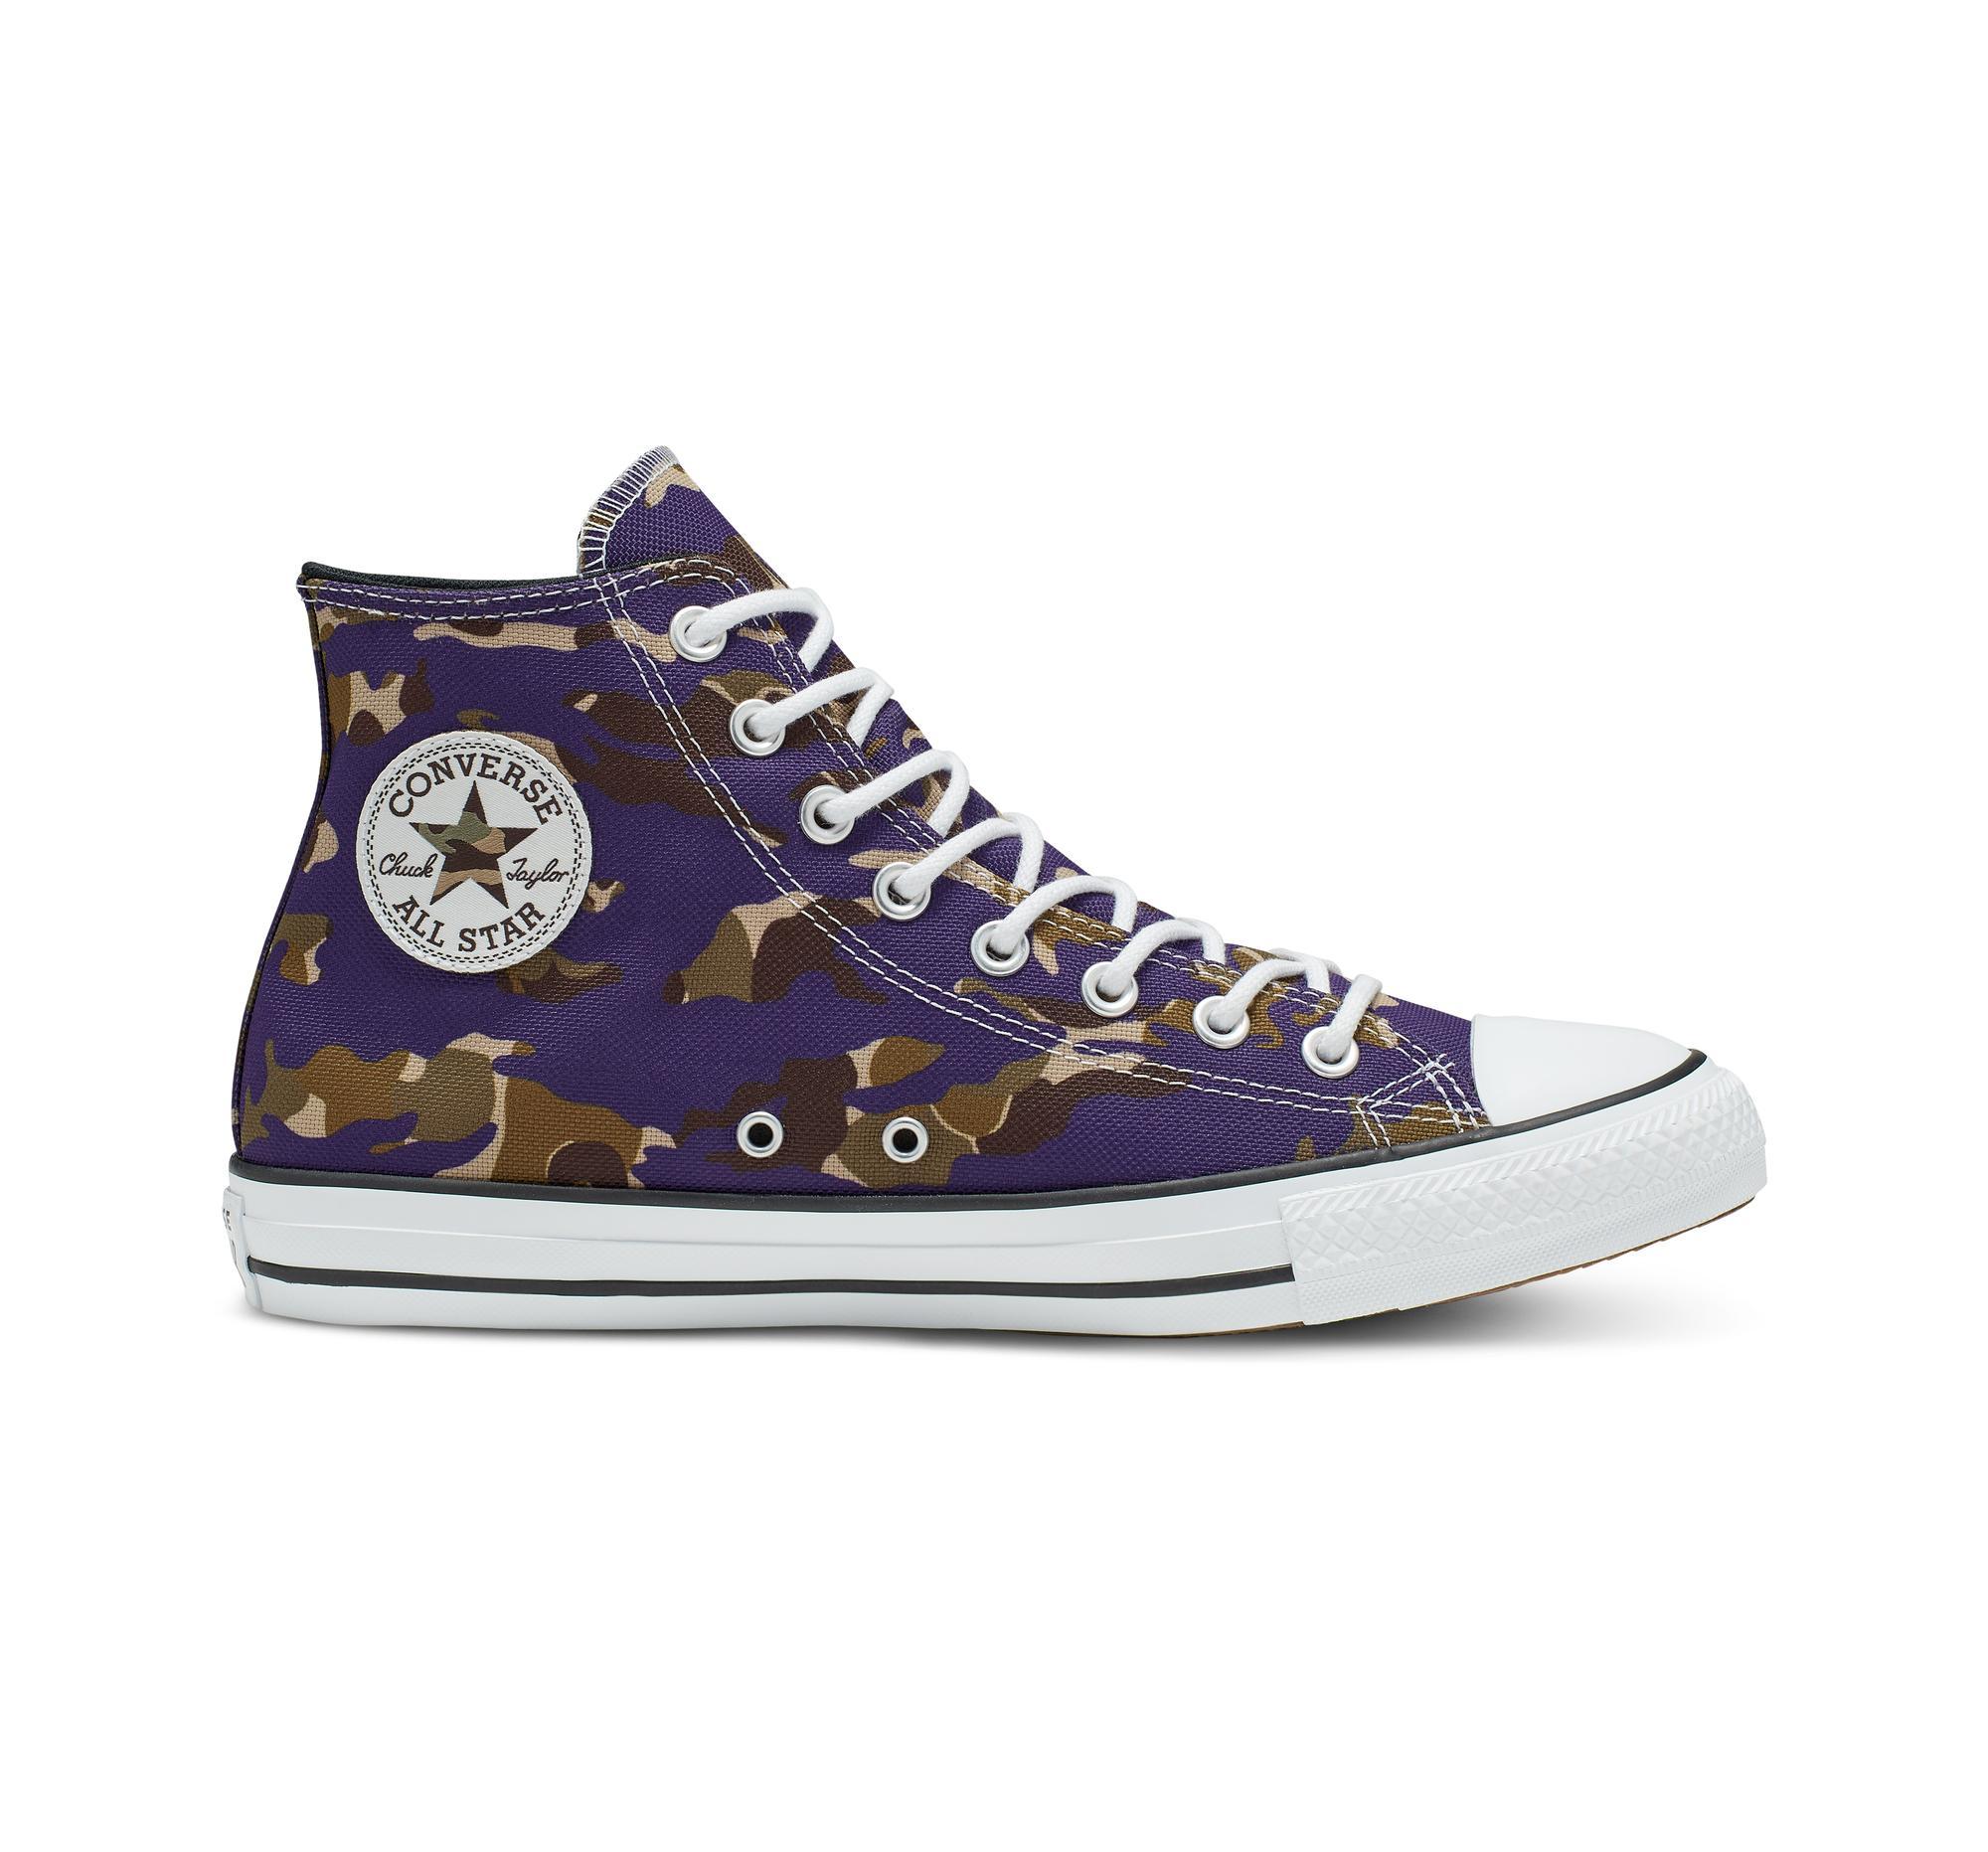 2converse chuck taylor purple 38